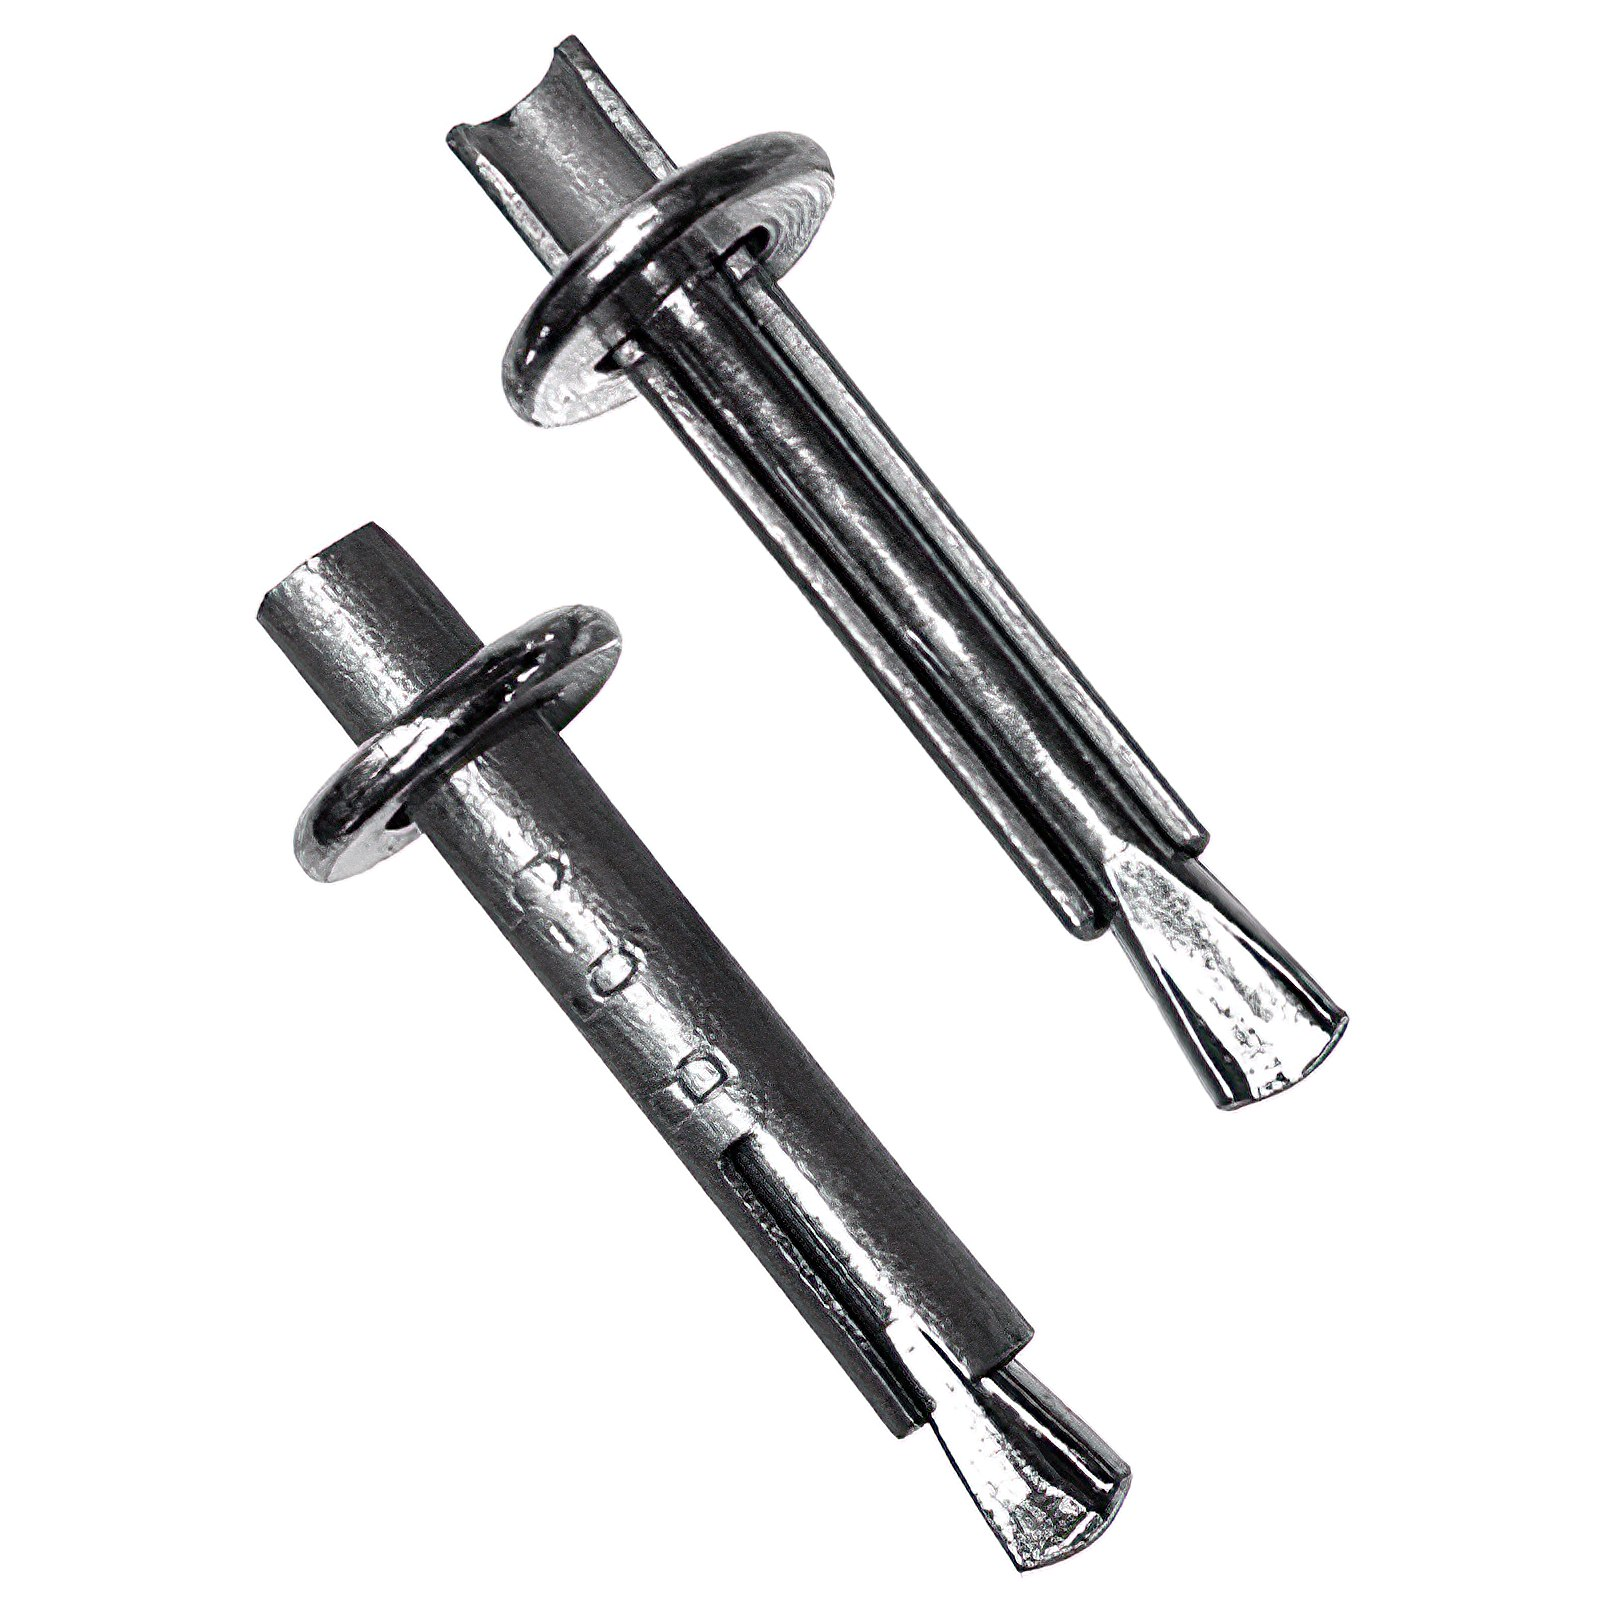 Bolt metalic, Knauf, pentru ancorare, 6 x 35 mm, 100 buc